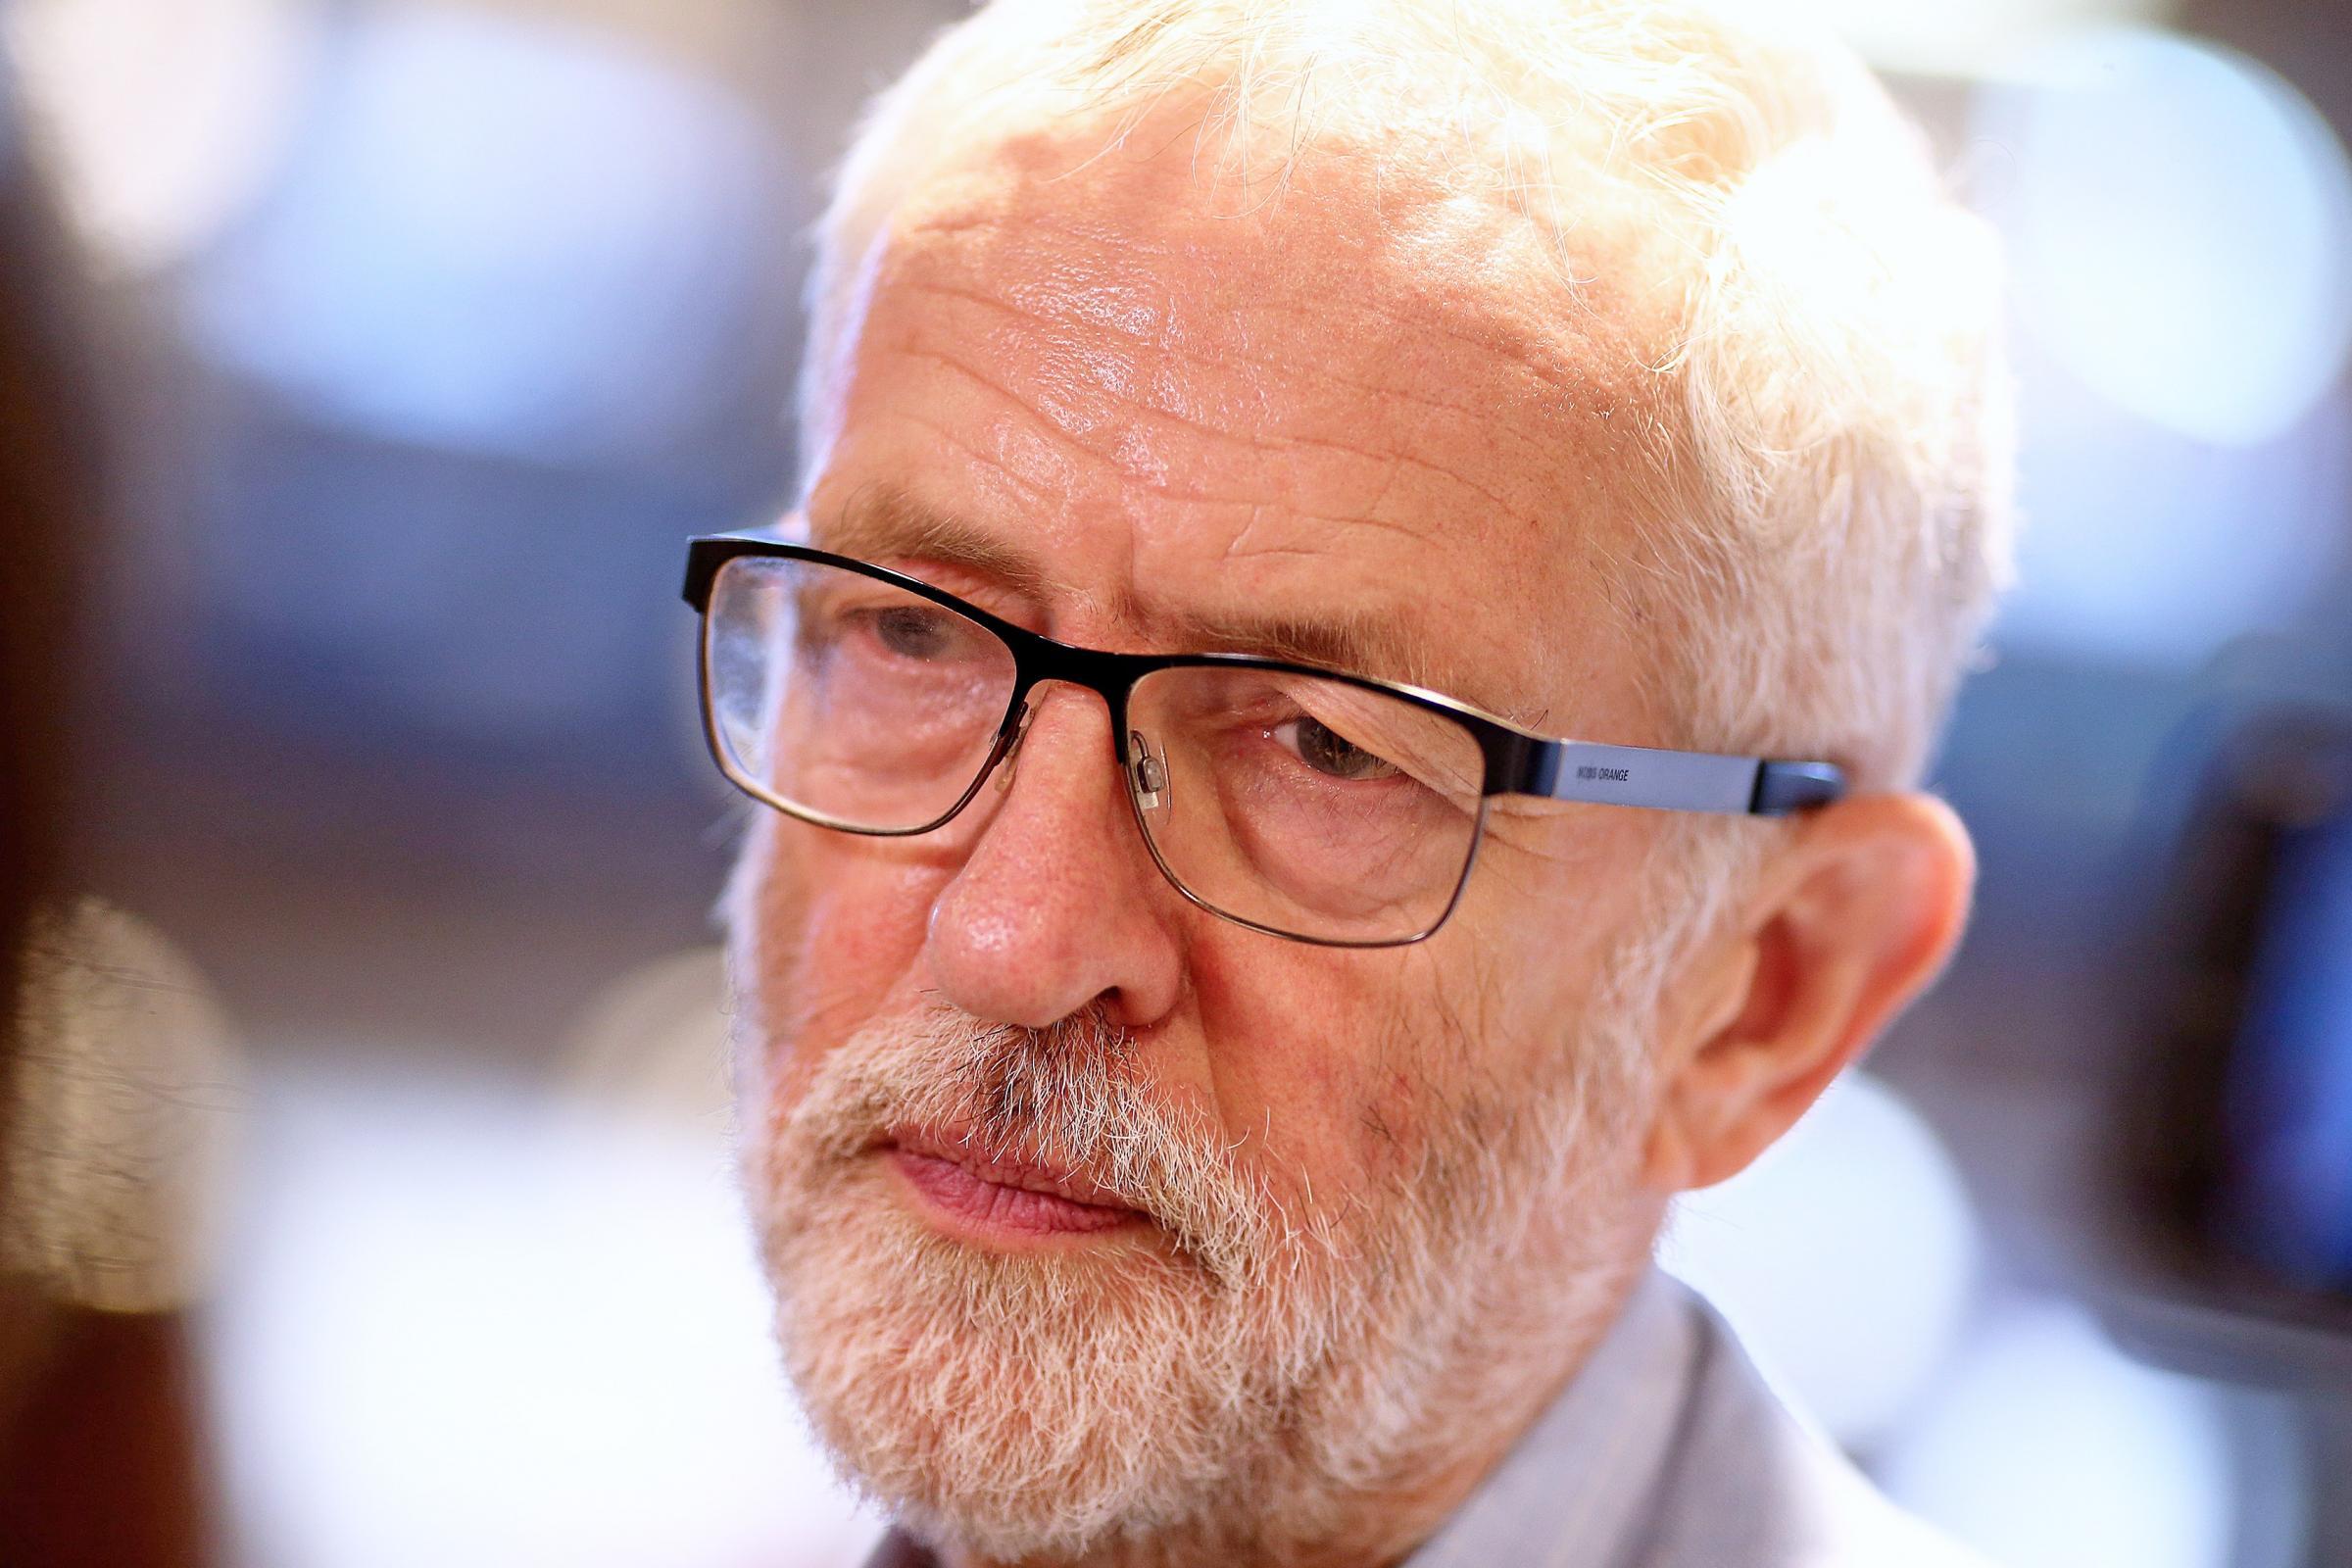 Jeremy Corbyn insists he should be caretaker PM despite failed plan